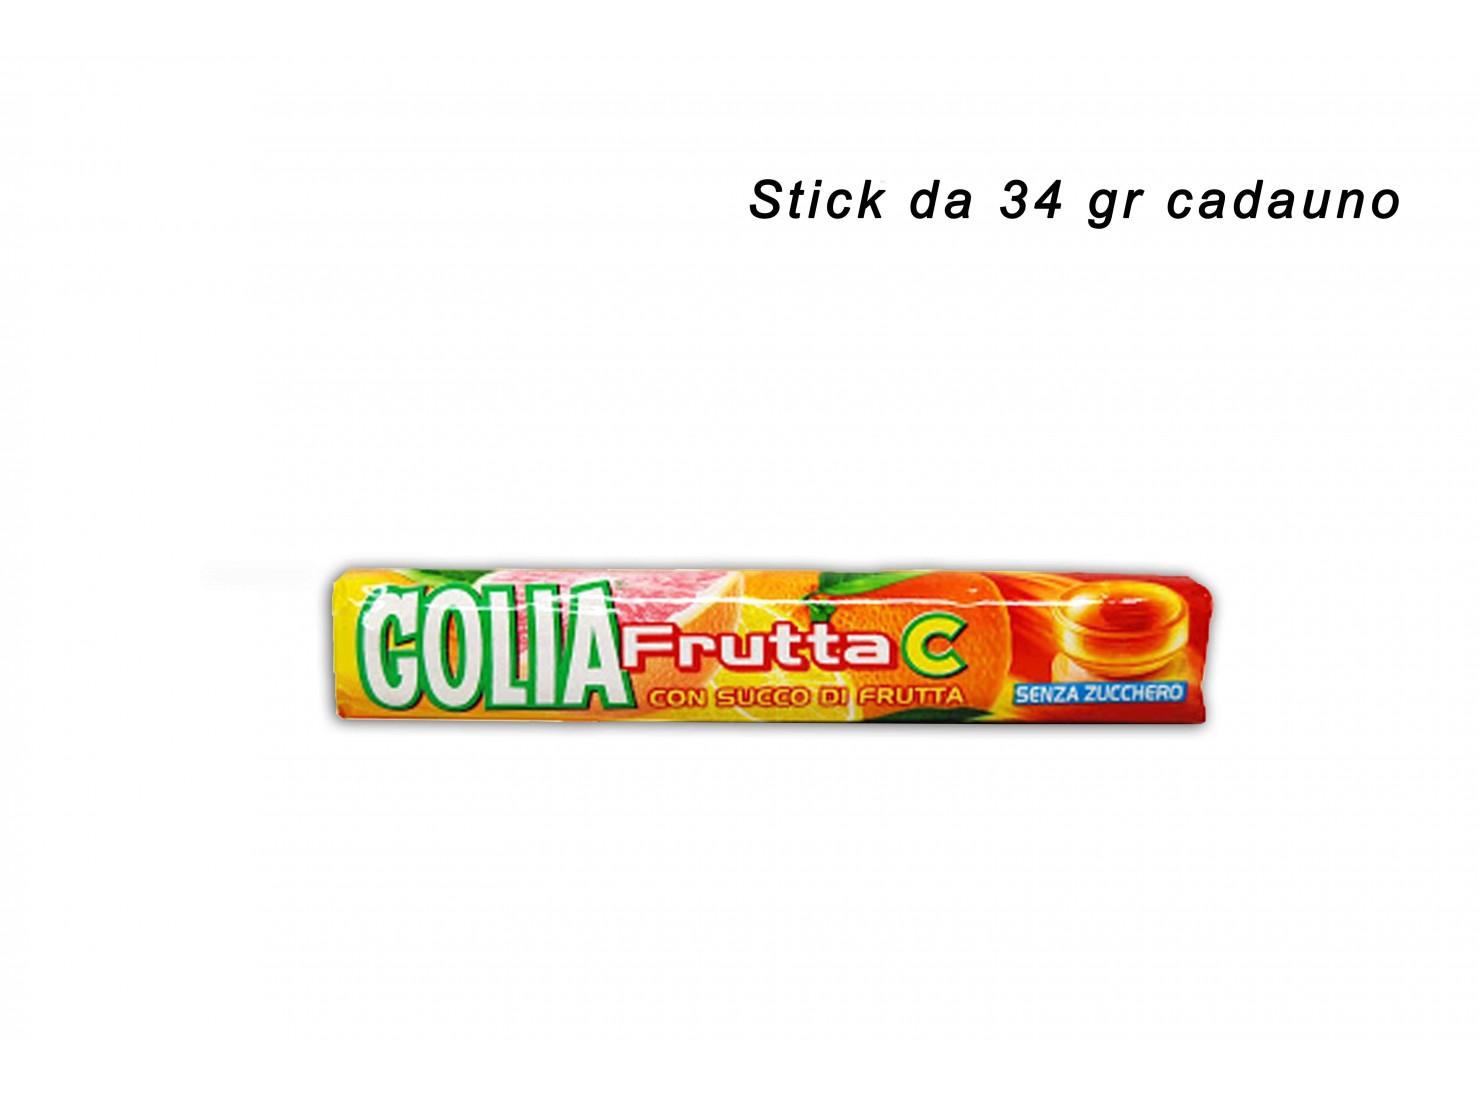 GOLIA FRUTTA C STICK 34 GR